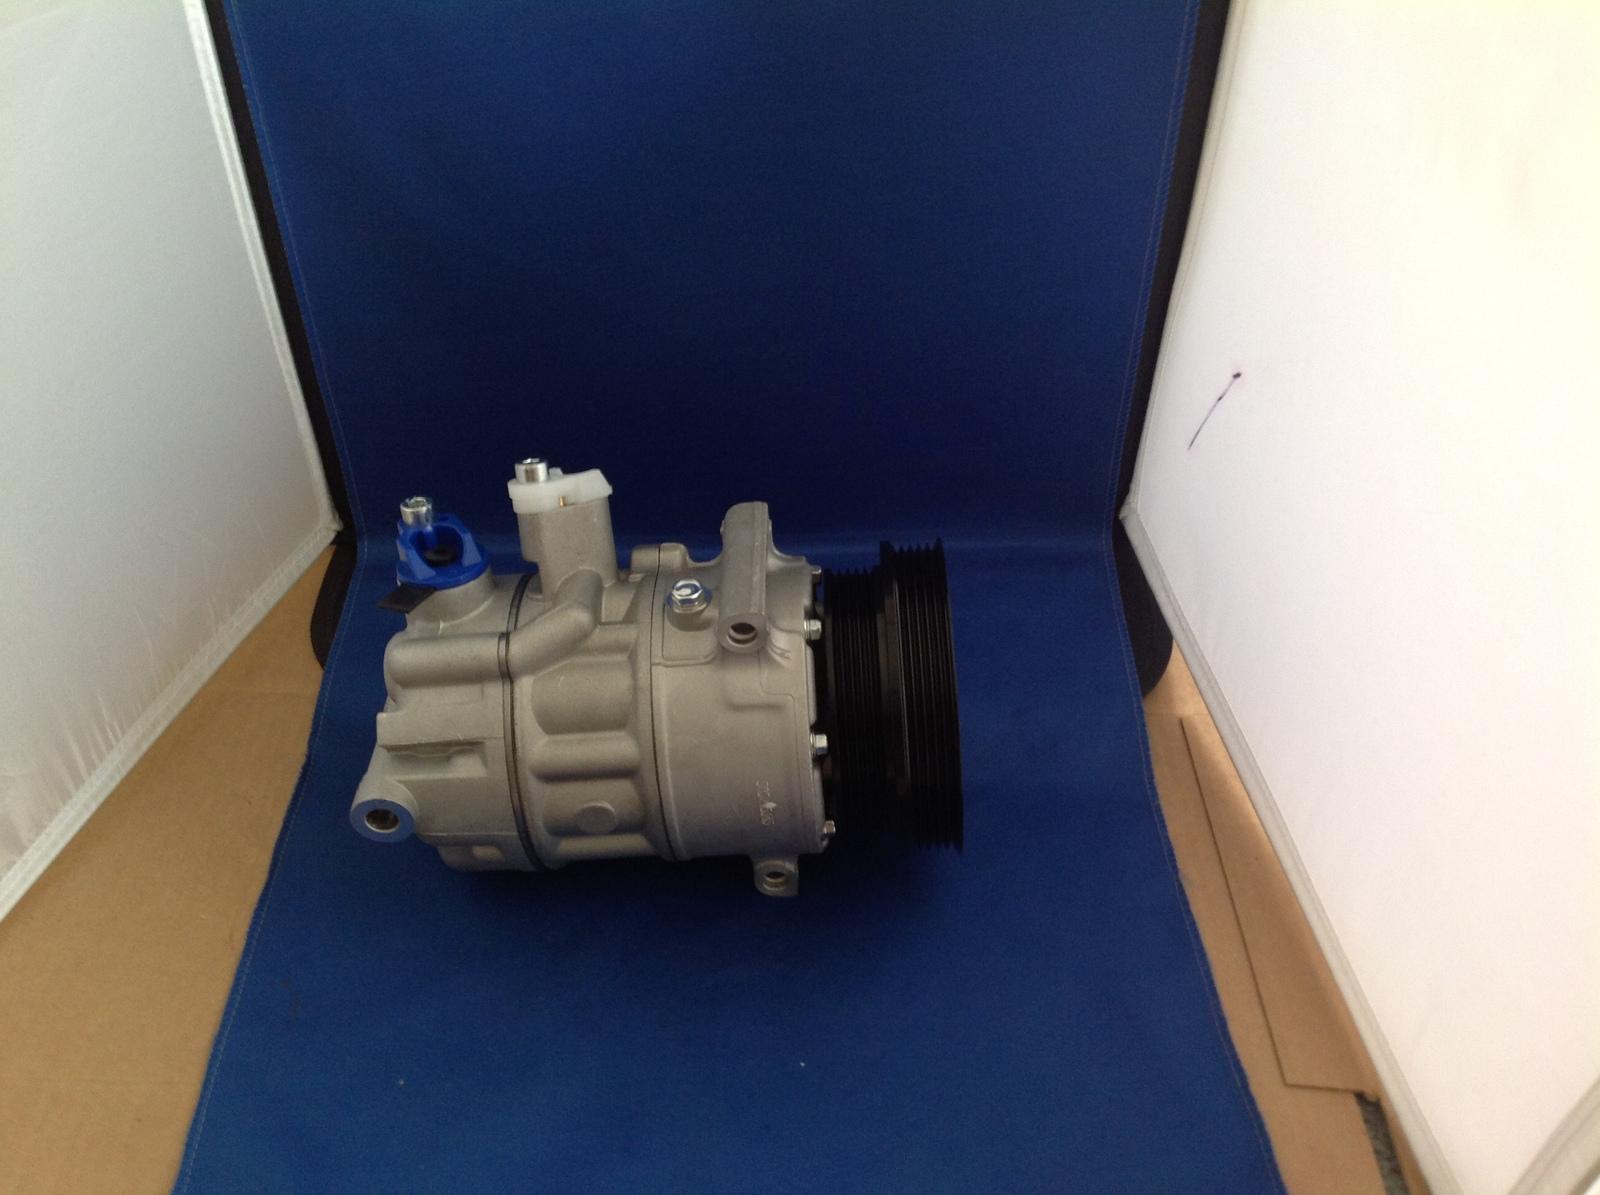 05-14 VW Volkswagen Jetta 2.5 Auto AC Air Conditioning Compressor Repair Kit